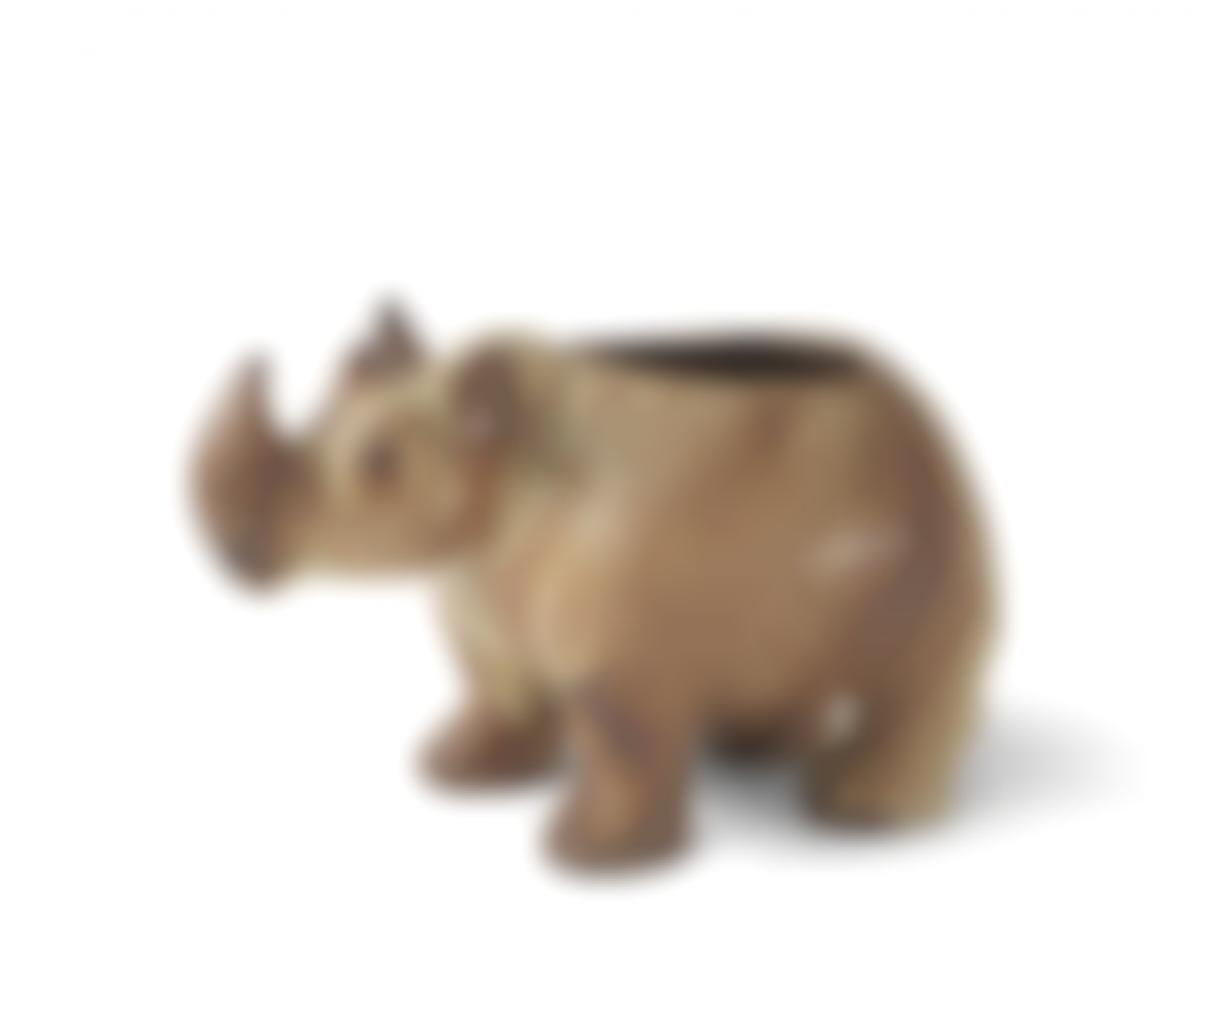 Coco - A Rhinoceros Vessel-2017